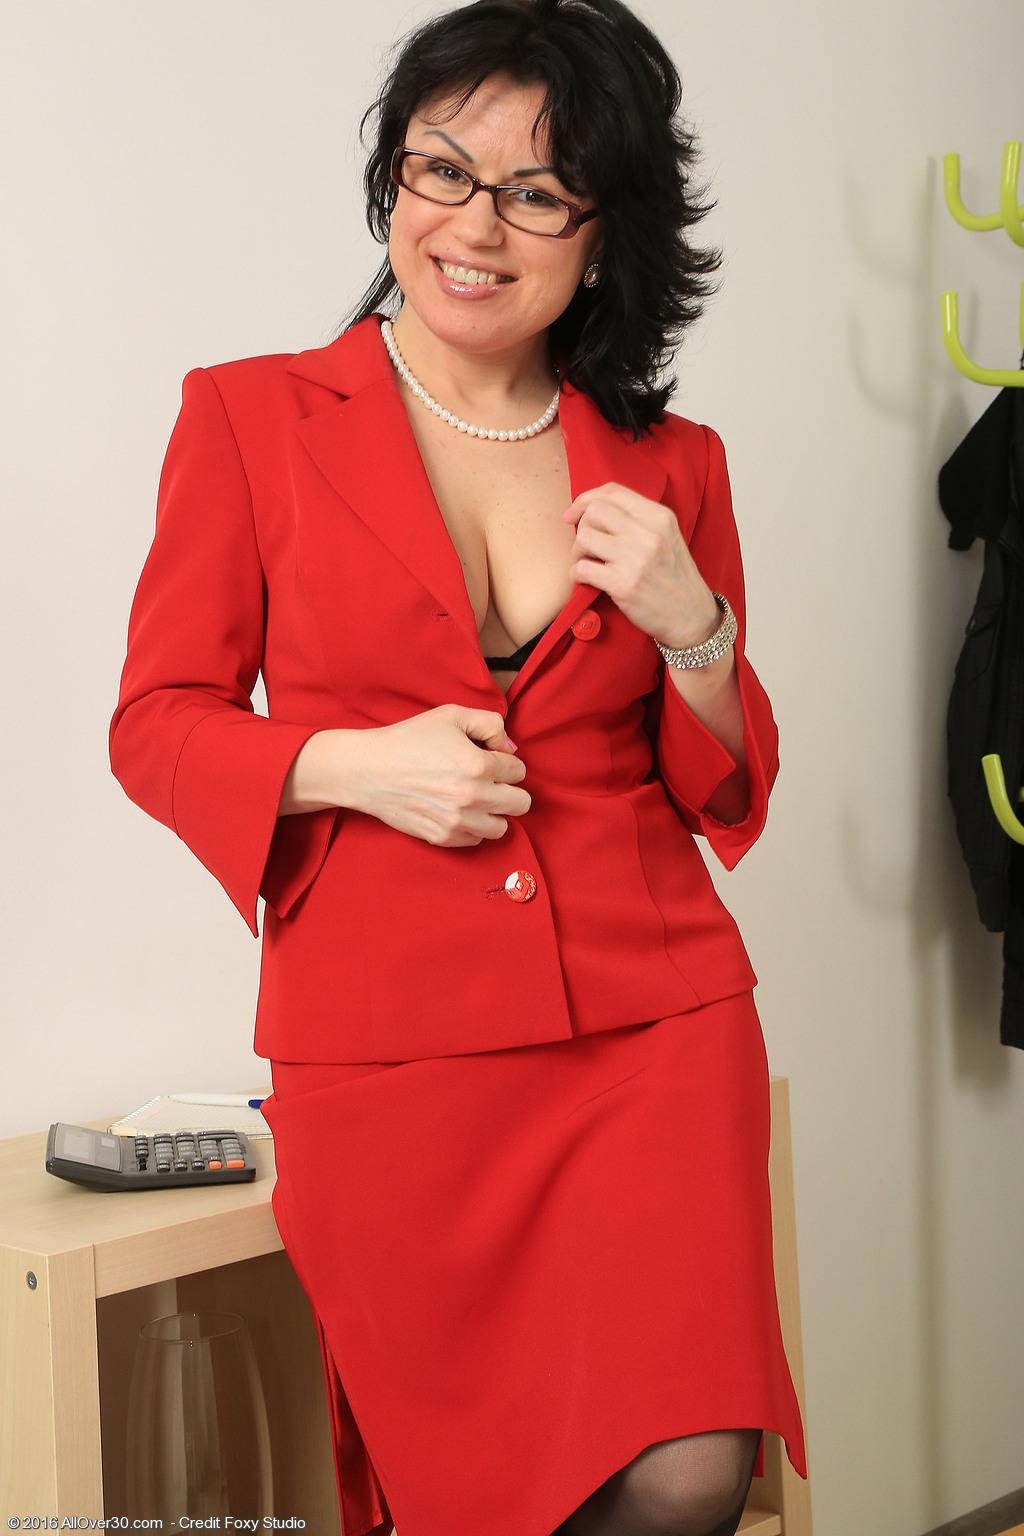 Cynthia lynn from hogan's heros nude anime vids